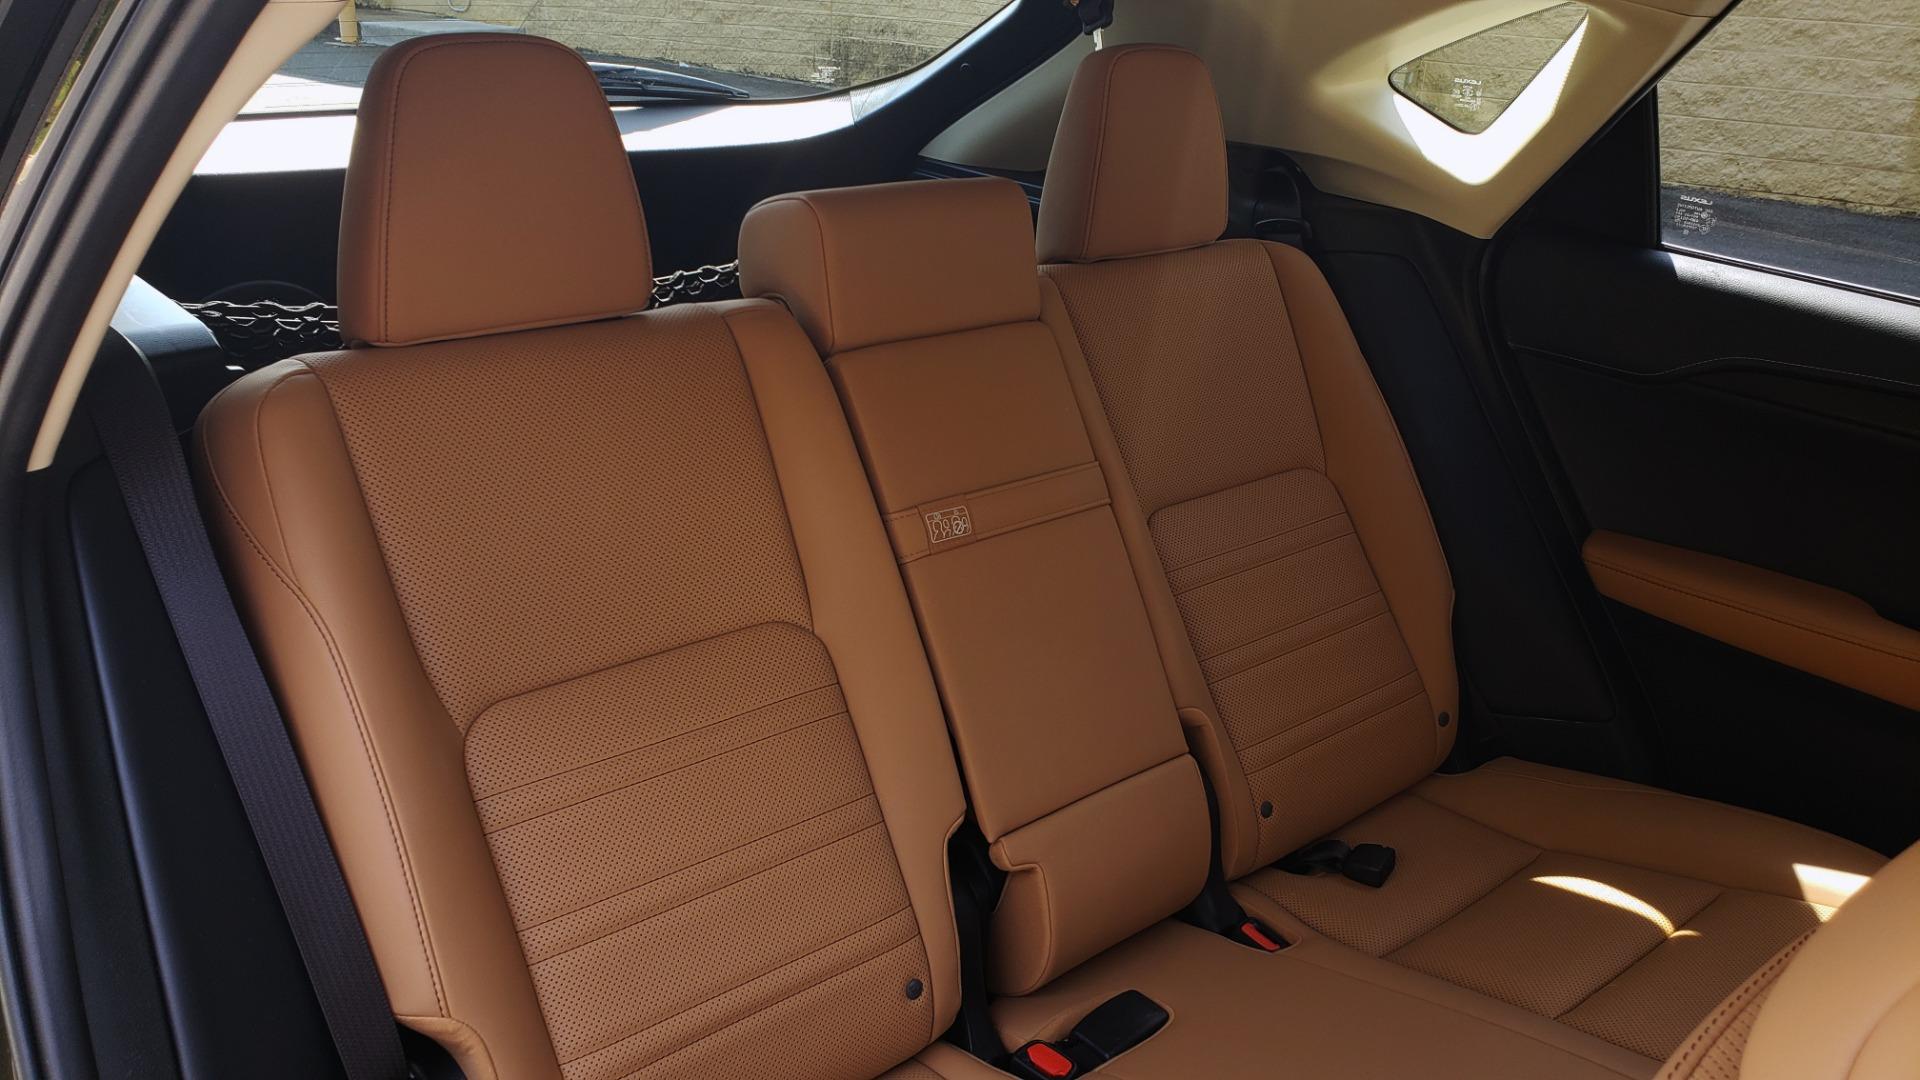 Used 2016 Lexus NX 200T PREM PKG / NAV / SUNROOF / PRE-COLLISION / PARK ASST for sale Sold at Formula Imports in Charlotte NC 28227 74